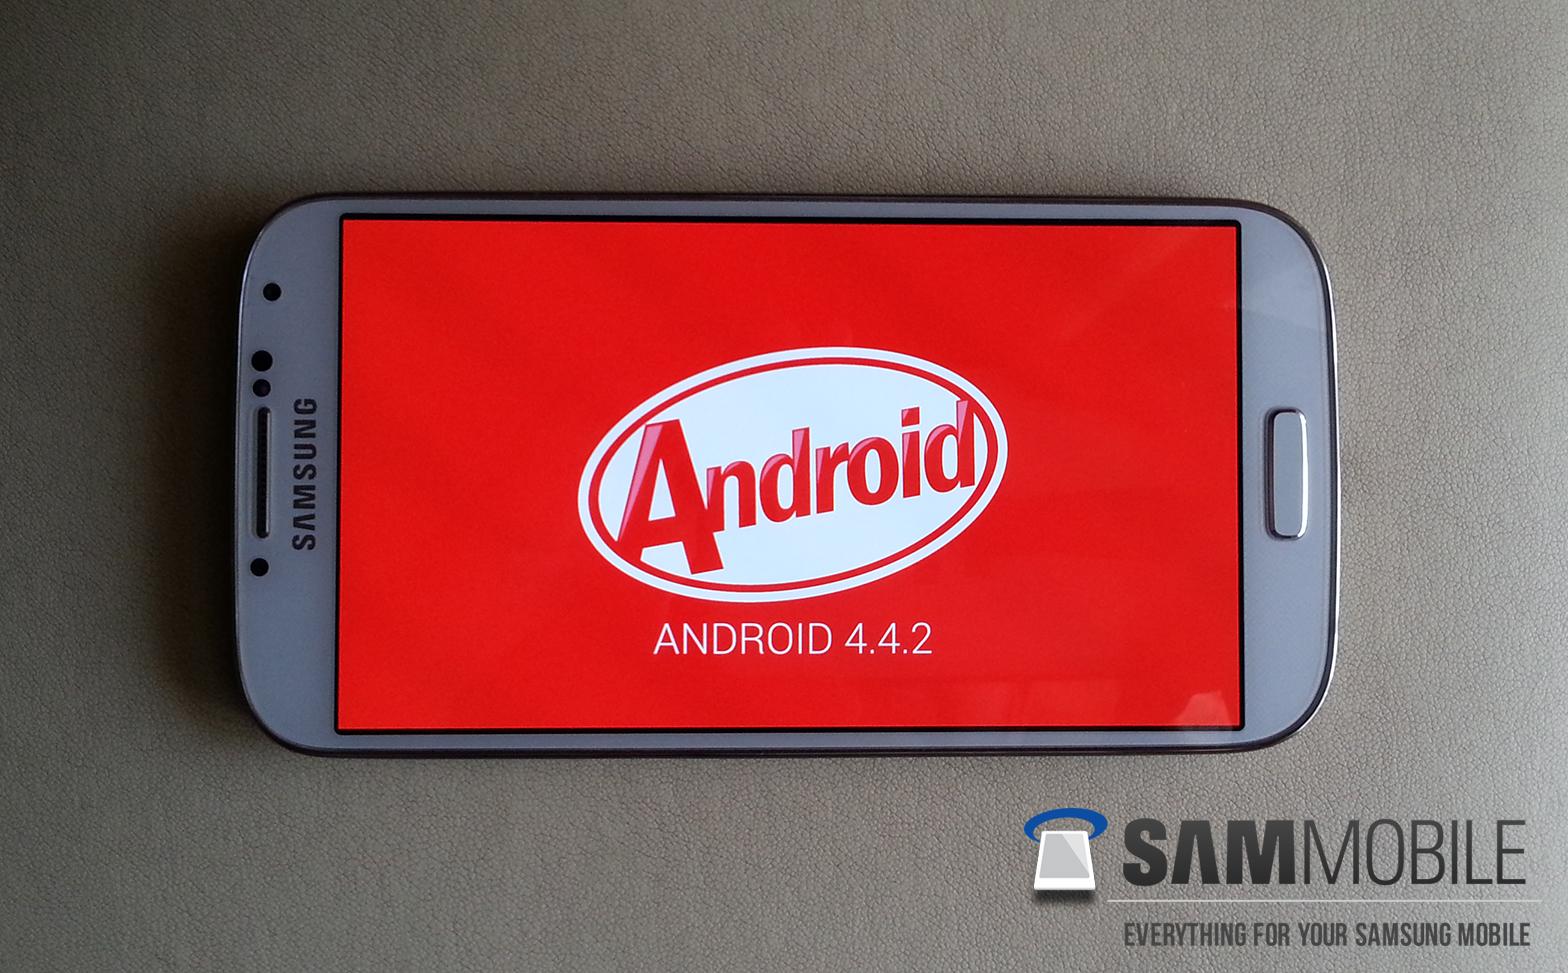 Photo of Galaxy S4 (i9500) Android 4.4.2 Orjinal Sürüm Yükleme